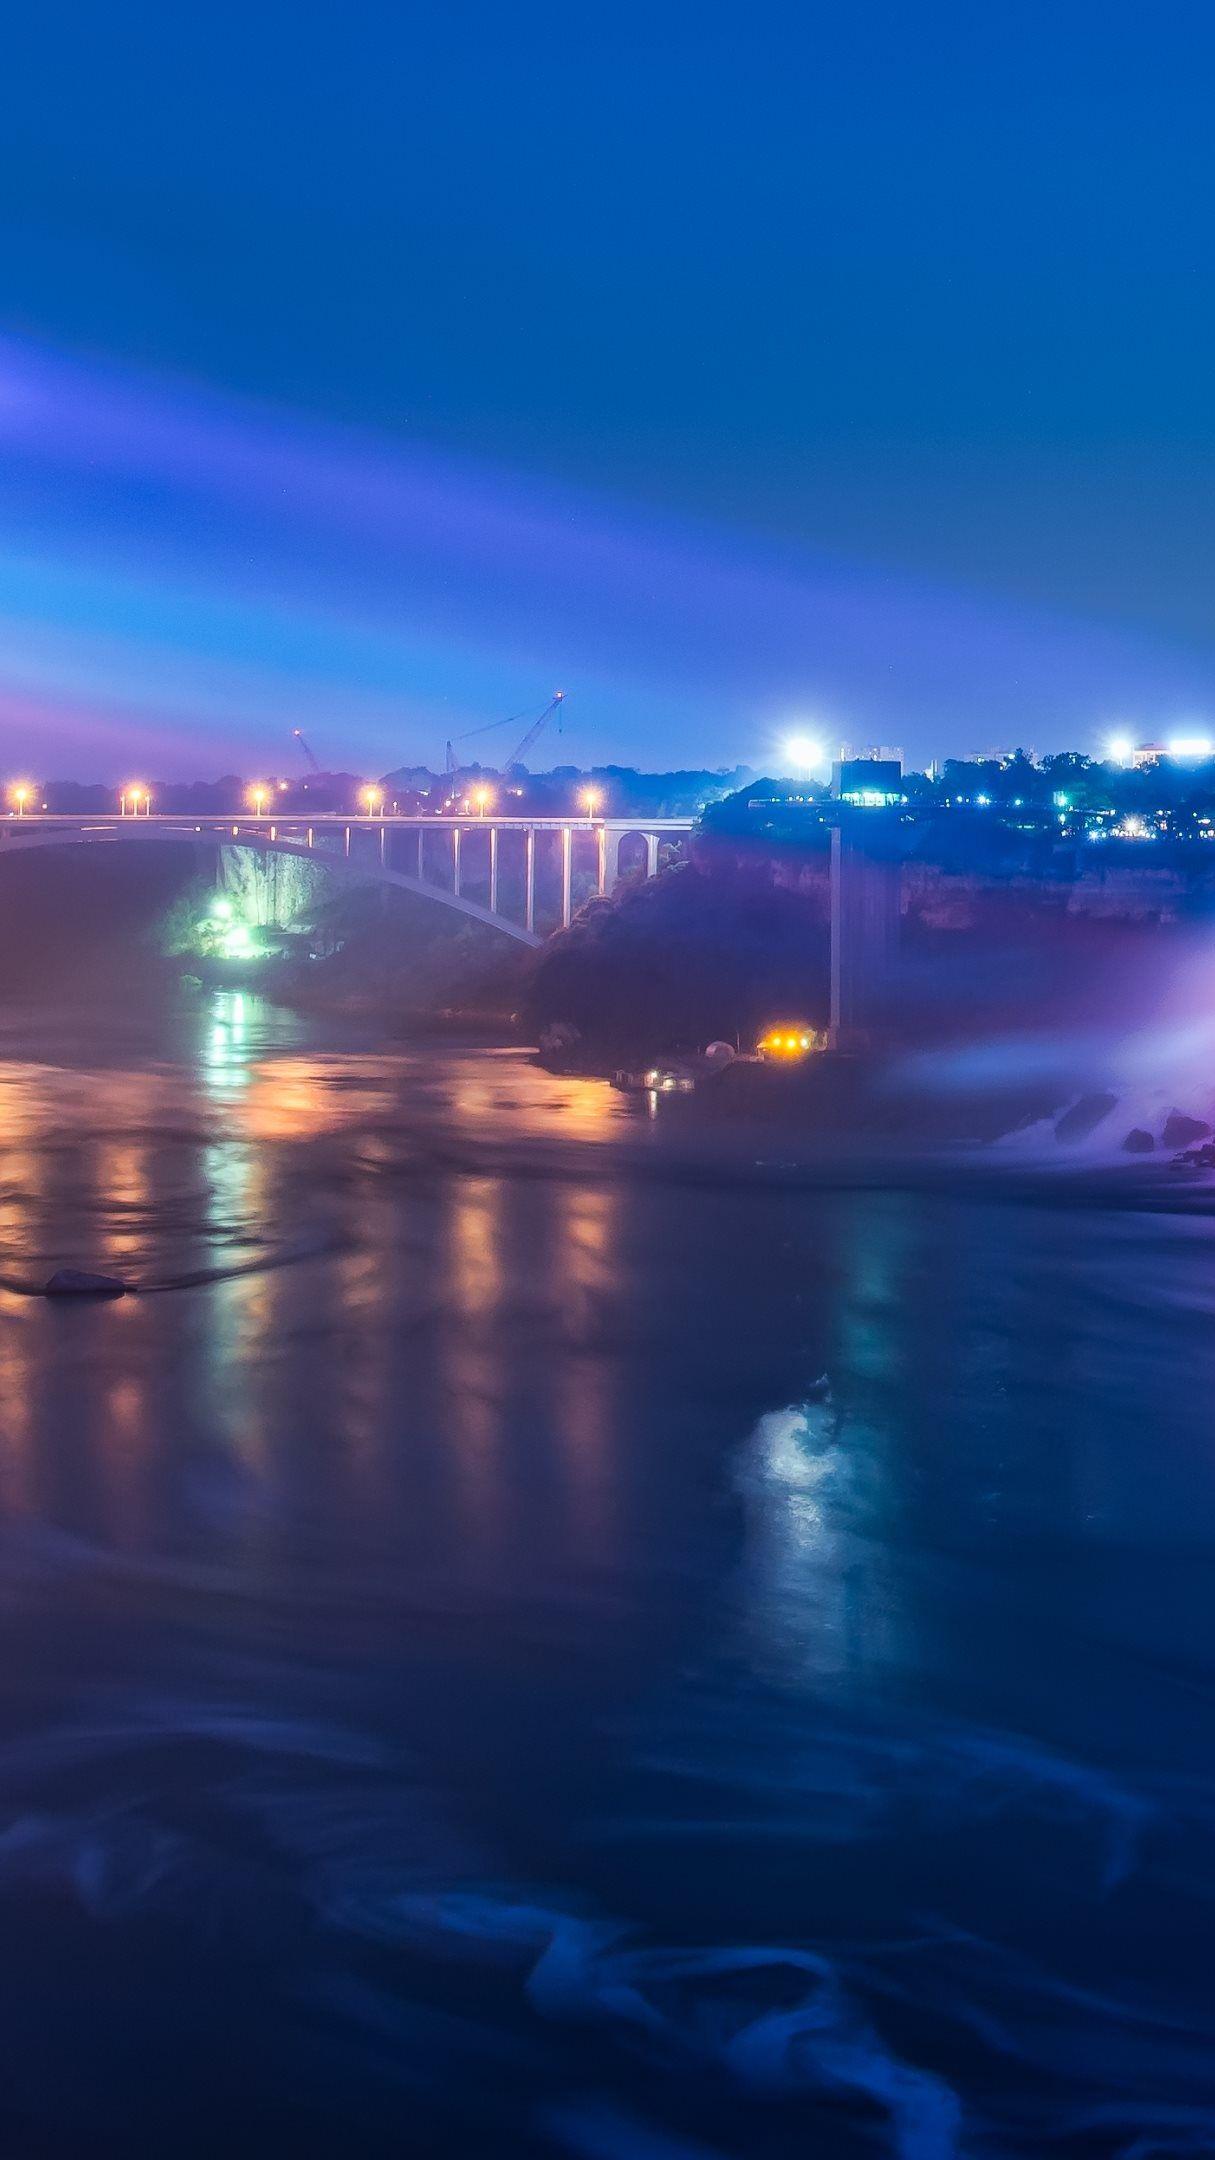 Niagara Falls And The Rainbow Bridge At Night 4k Ultrahd